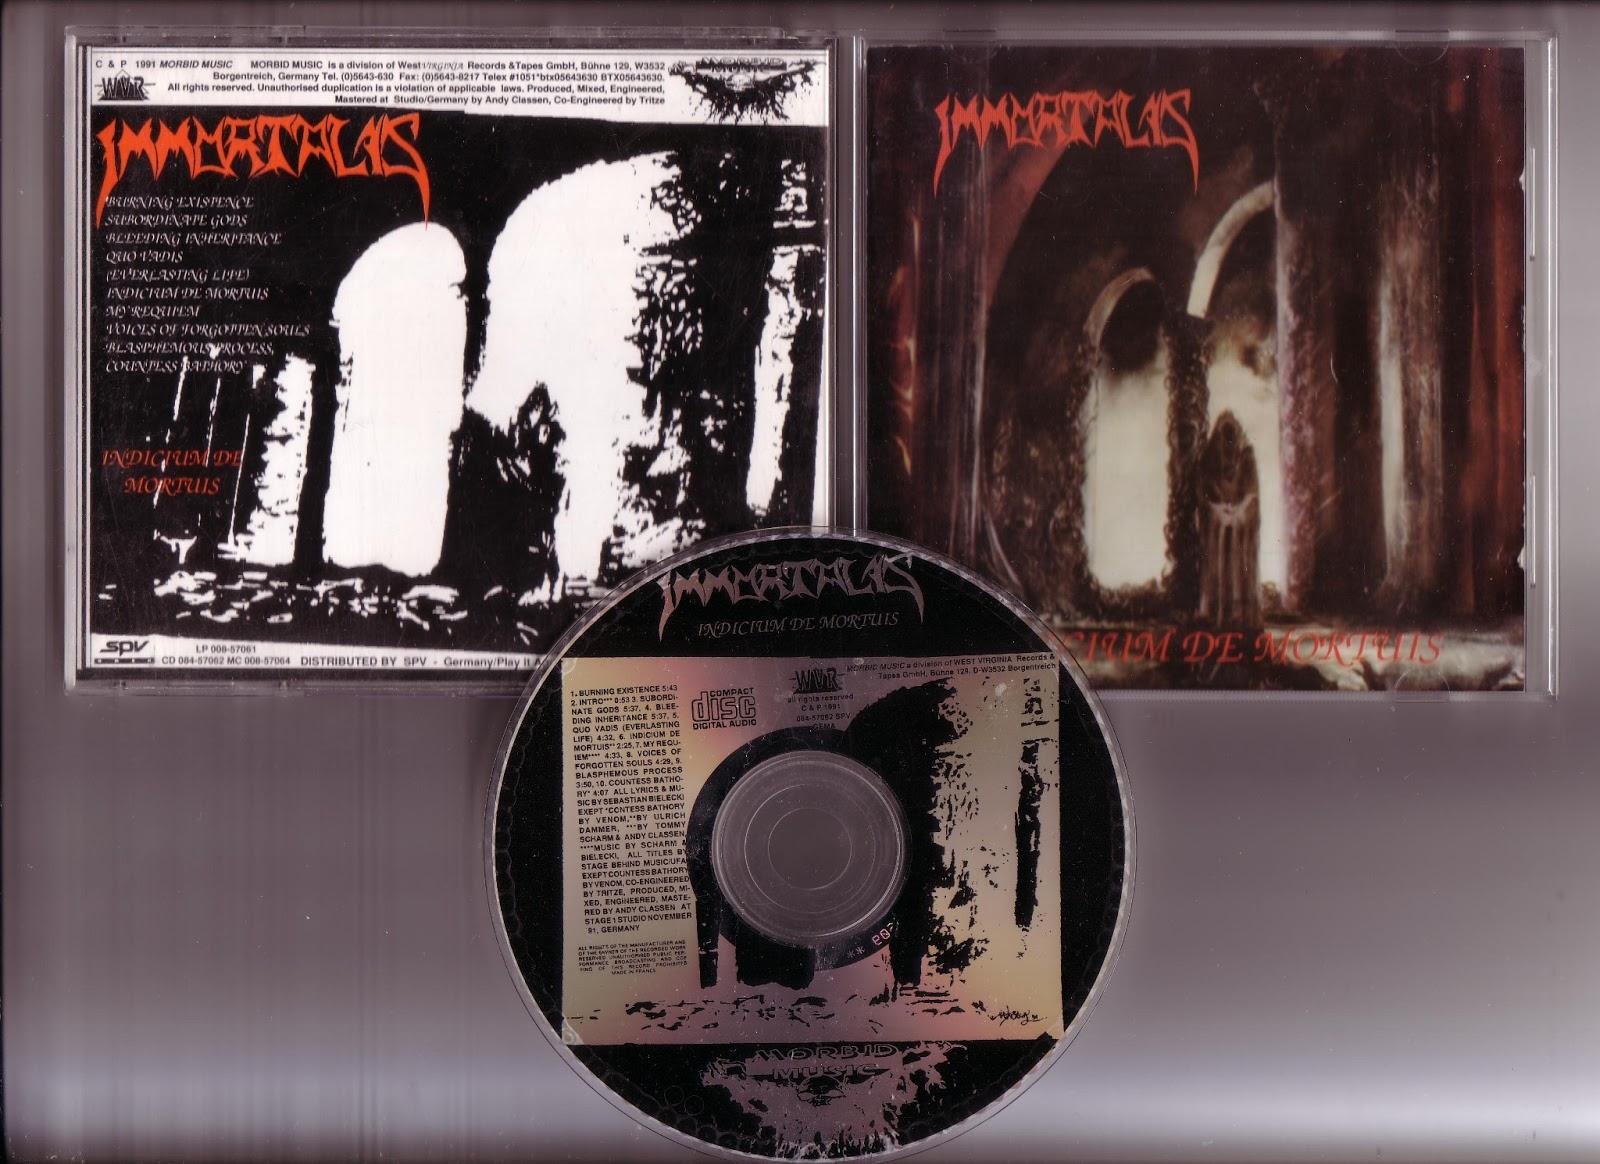 Source of Steel: Immortalis - Indicium De Mortuis